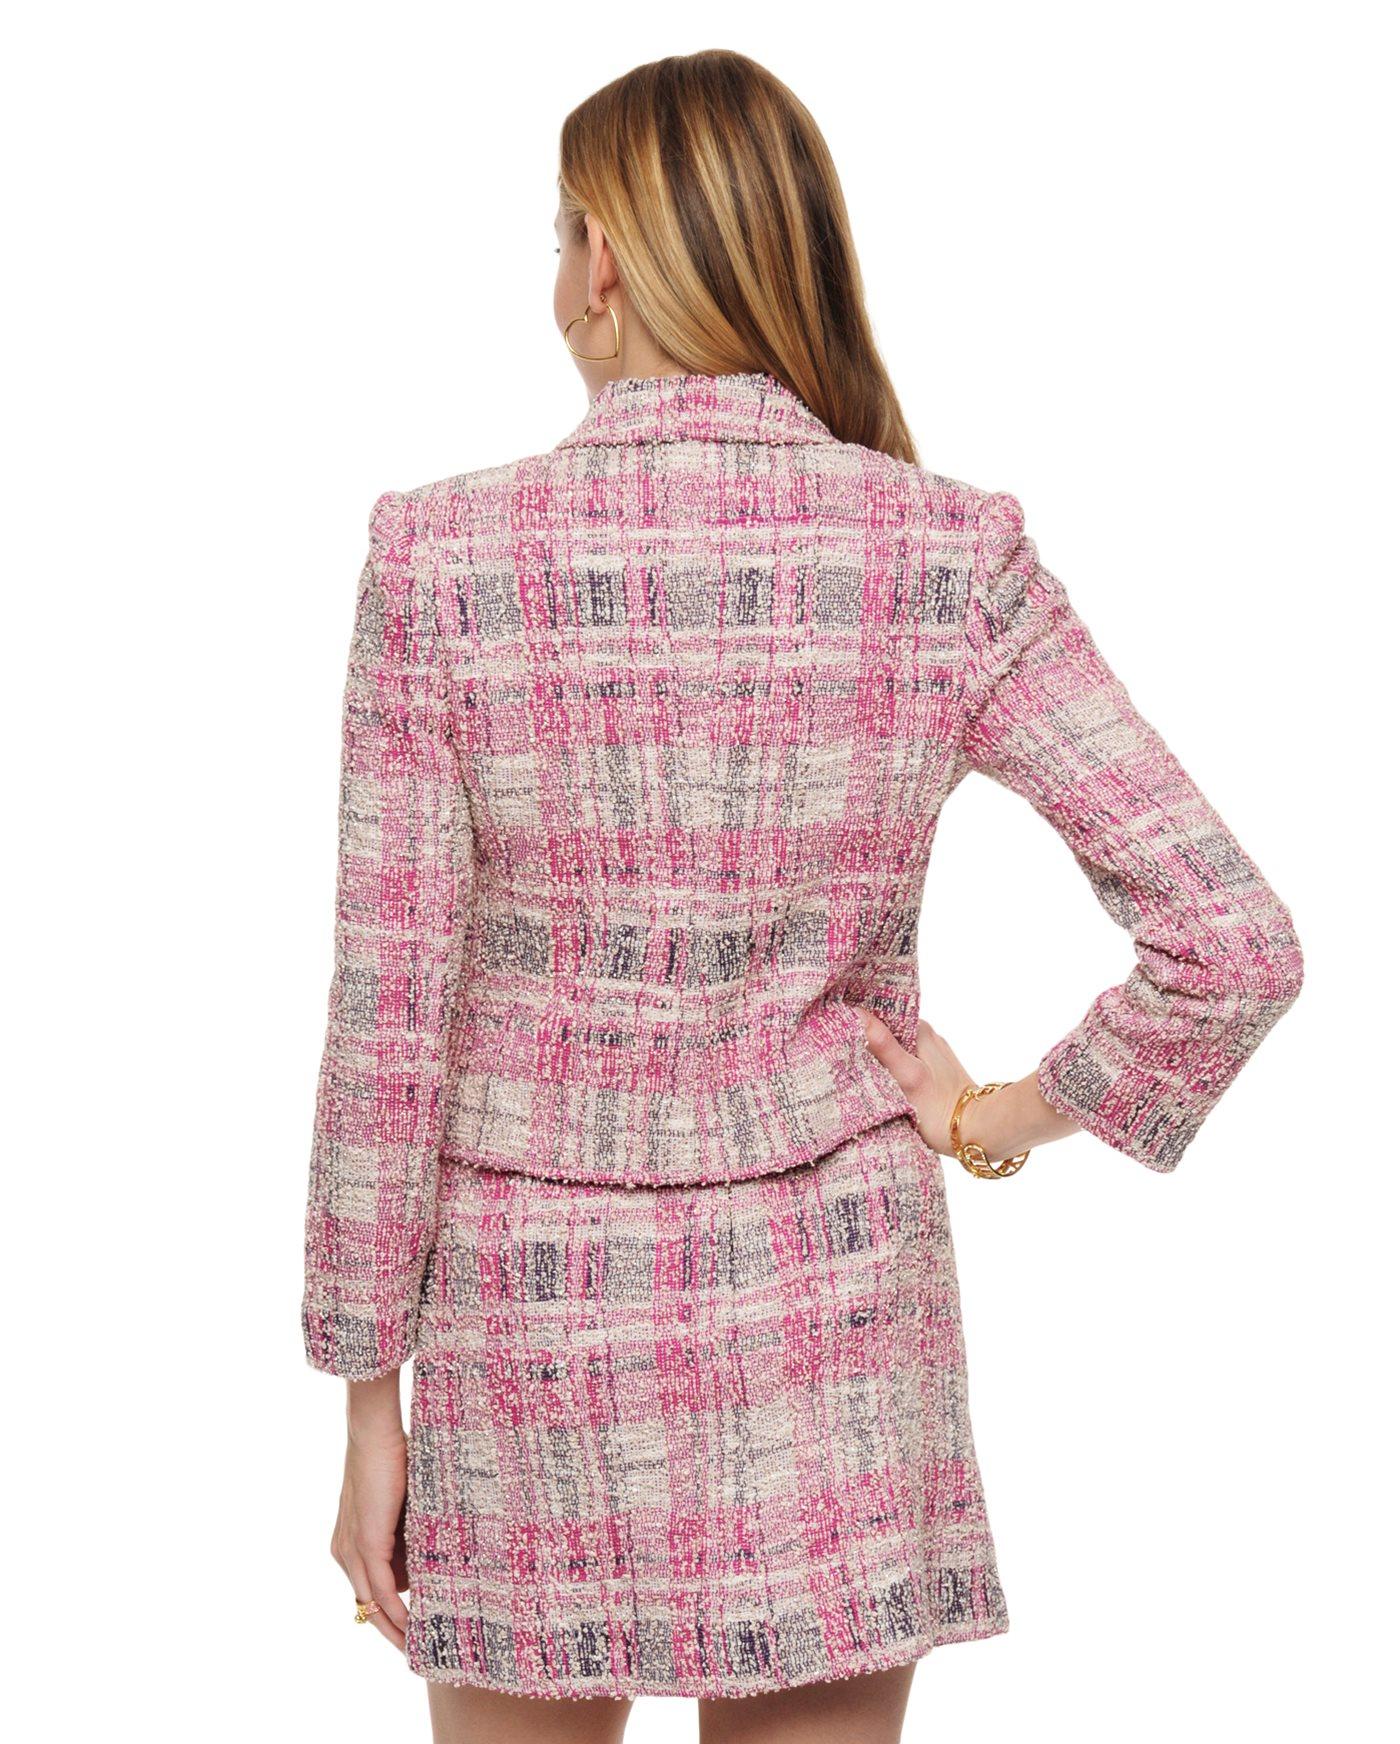 Juicy couture Plaid Lurex Boucle Jacket | Lyst